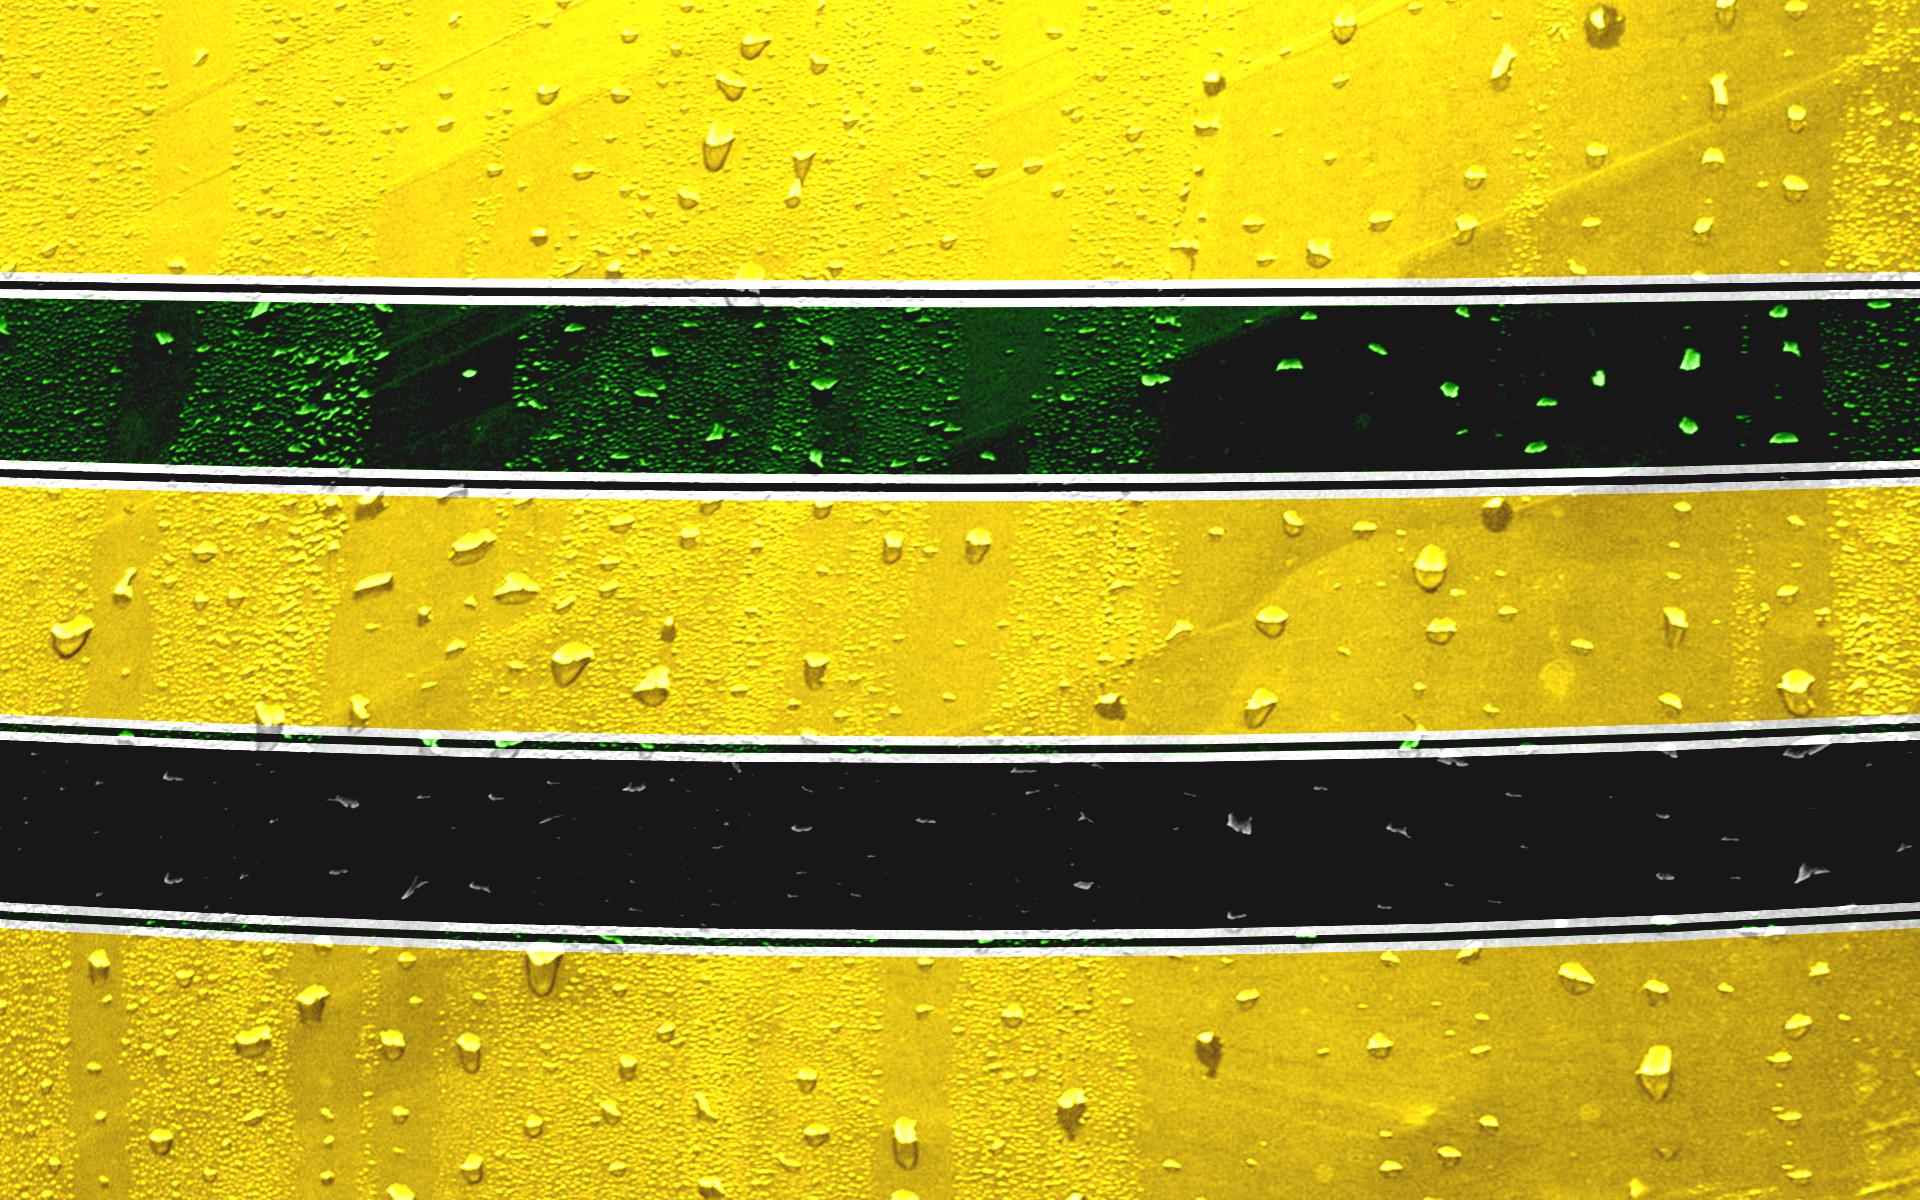 Senna Helmet - HD Wallpaper by spectravideo